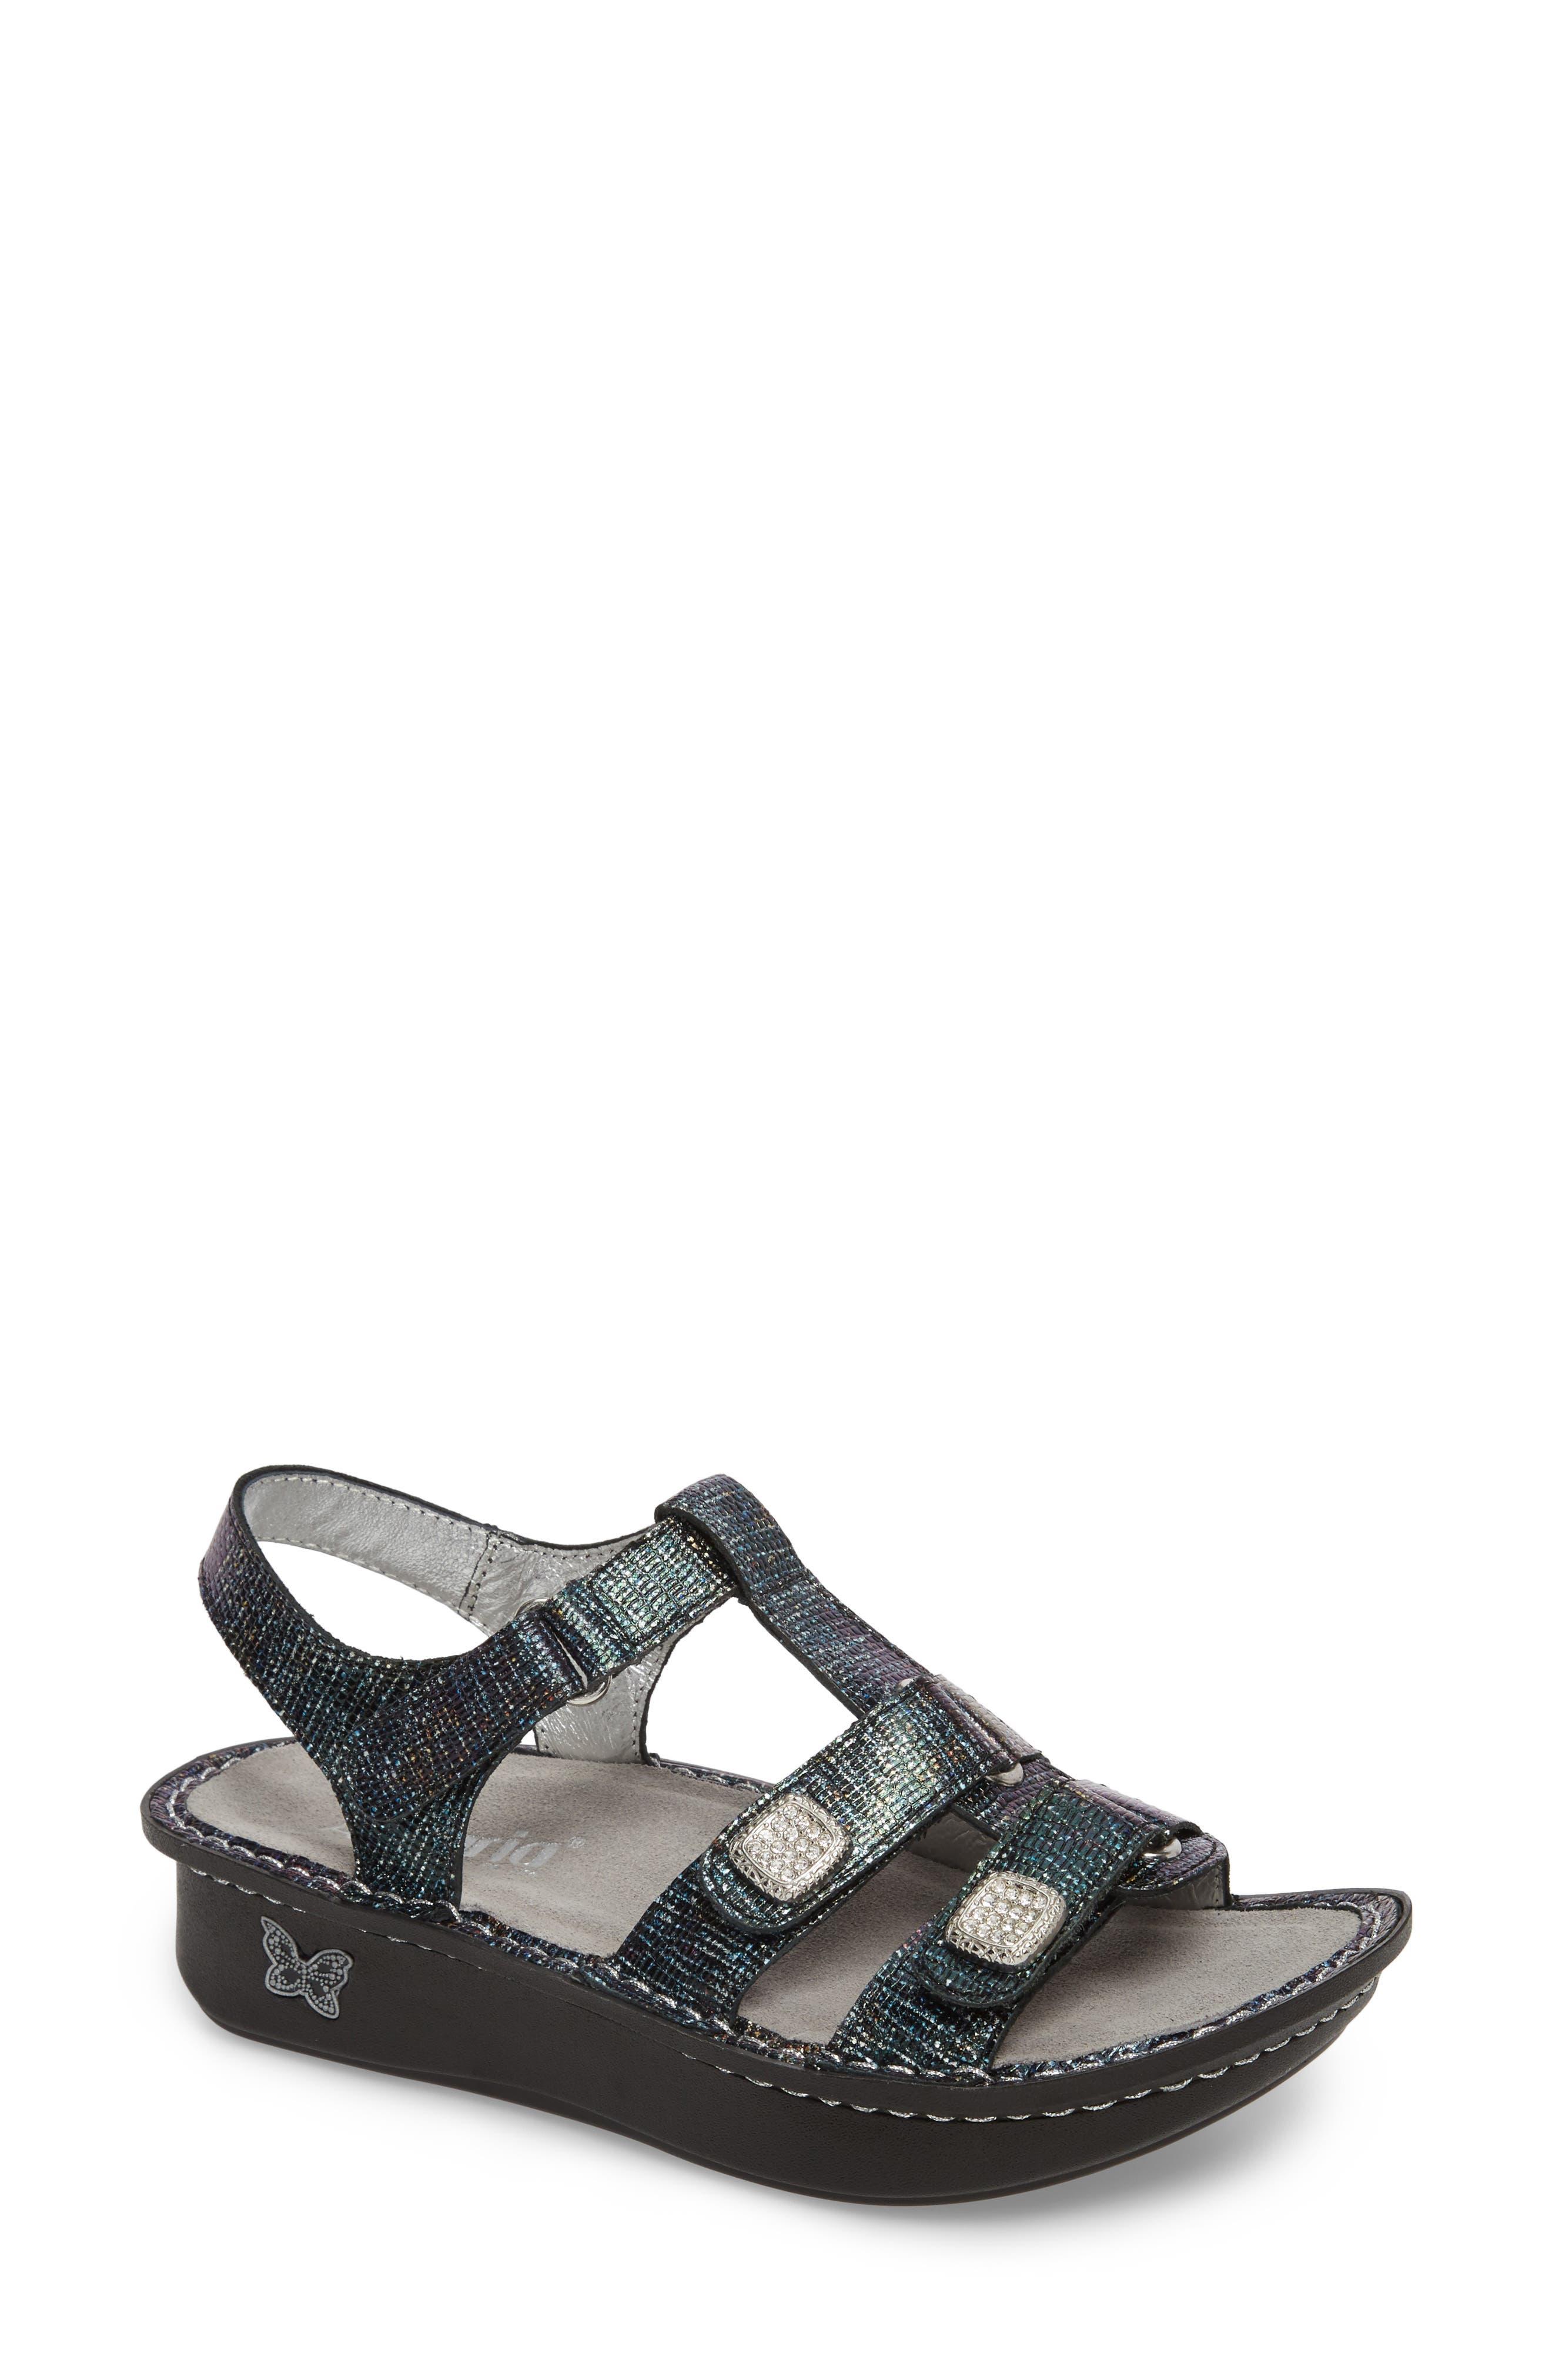 'Kleo' Sandal,                         Main,                         color, 002